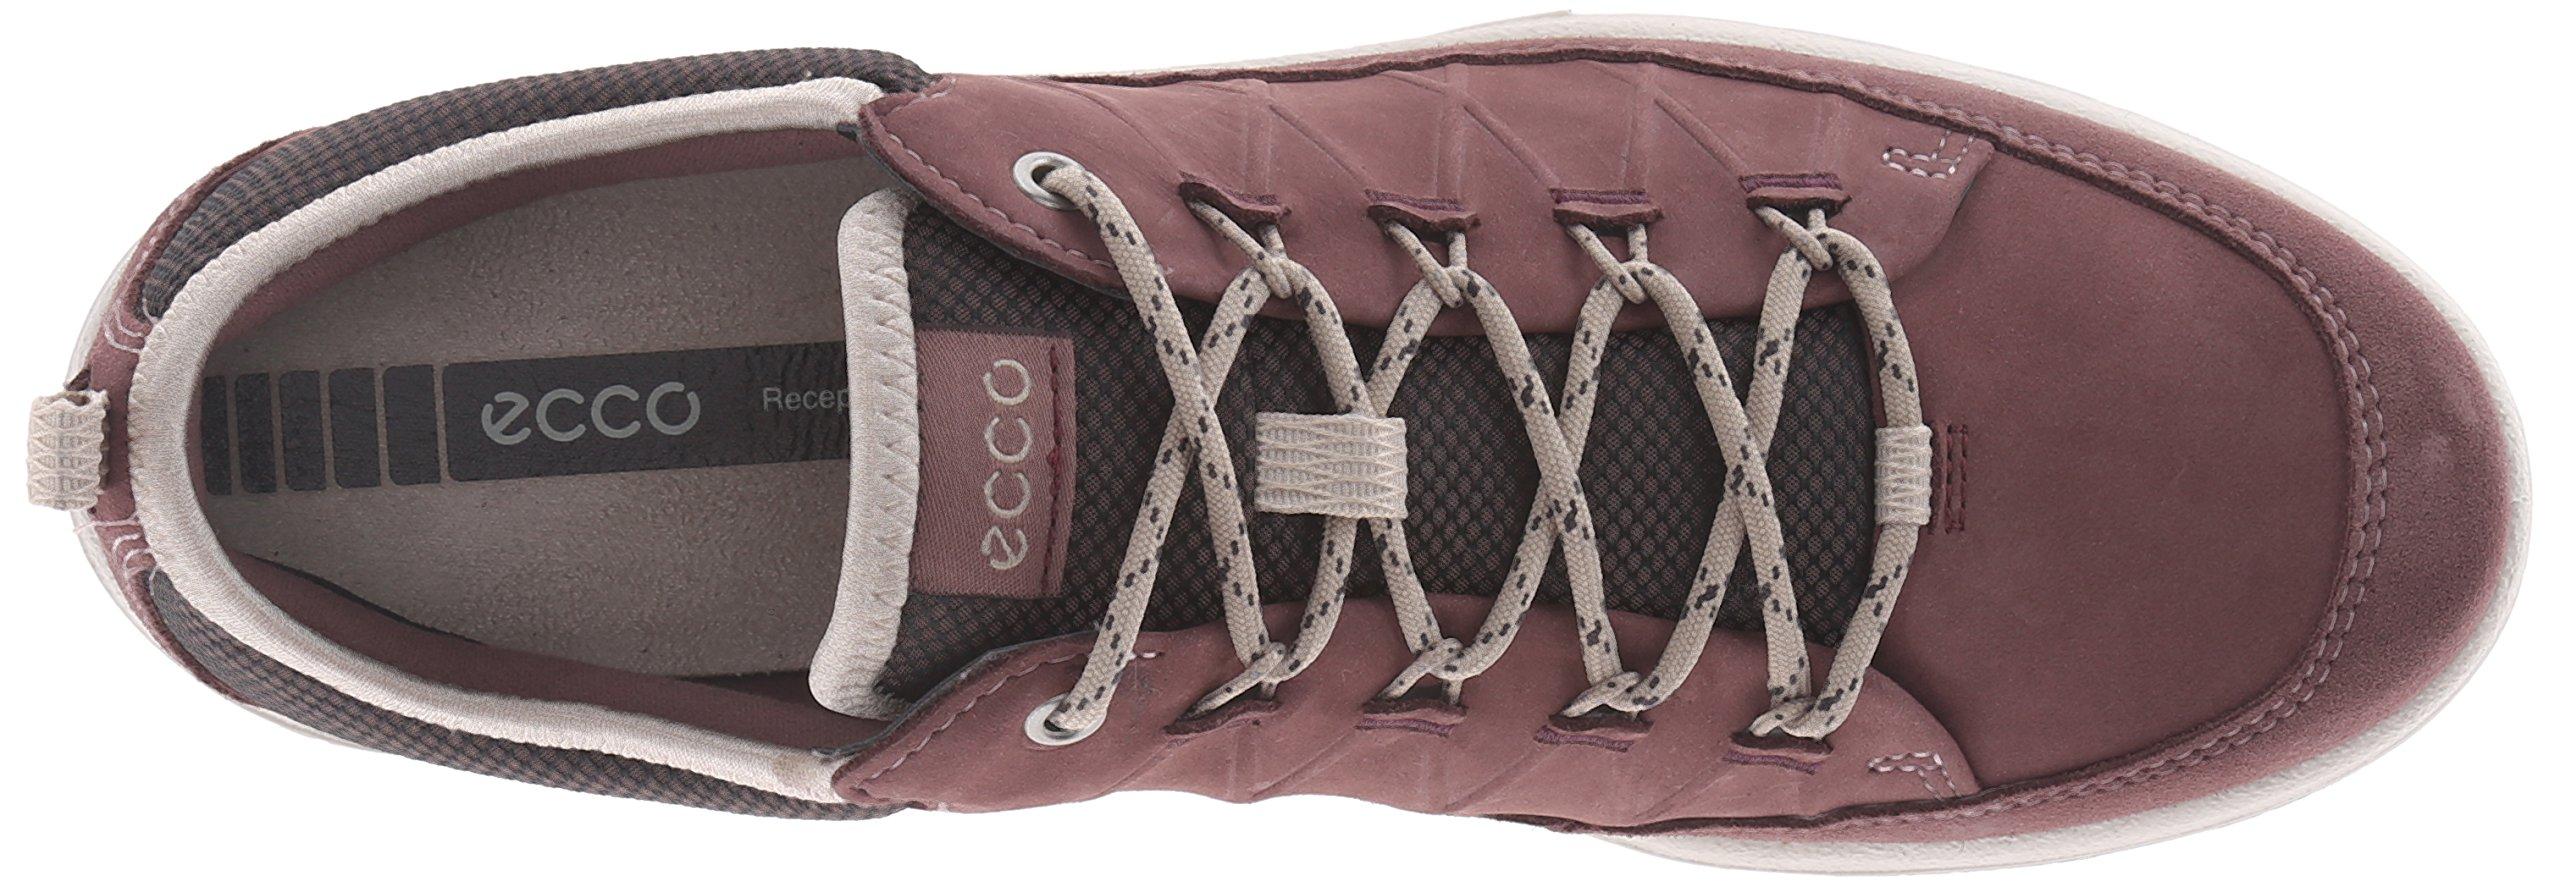 81BcBYXJxlL - ECCO Women's Aspina Multisport Outdoor Shoes